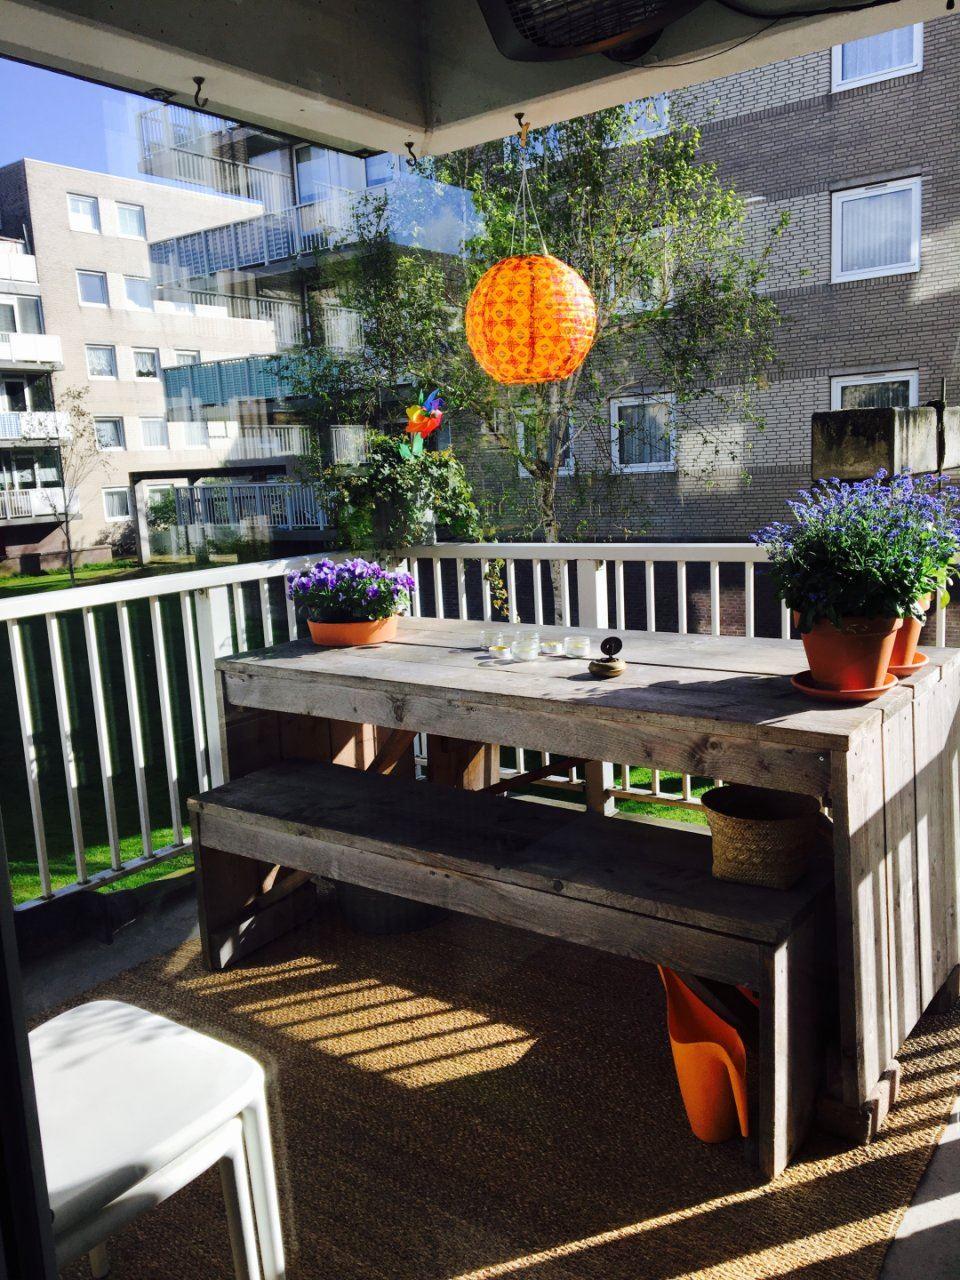 Apartment for rent: Jeltje de Bosch Kemperpad 125 1 1054 ...